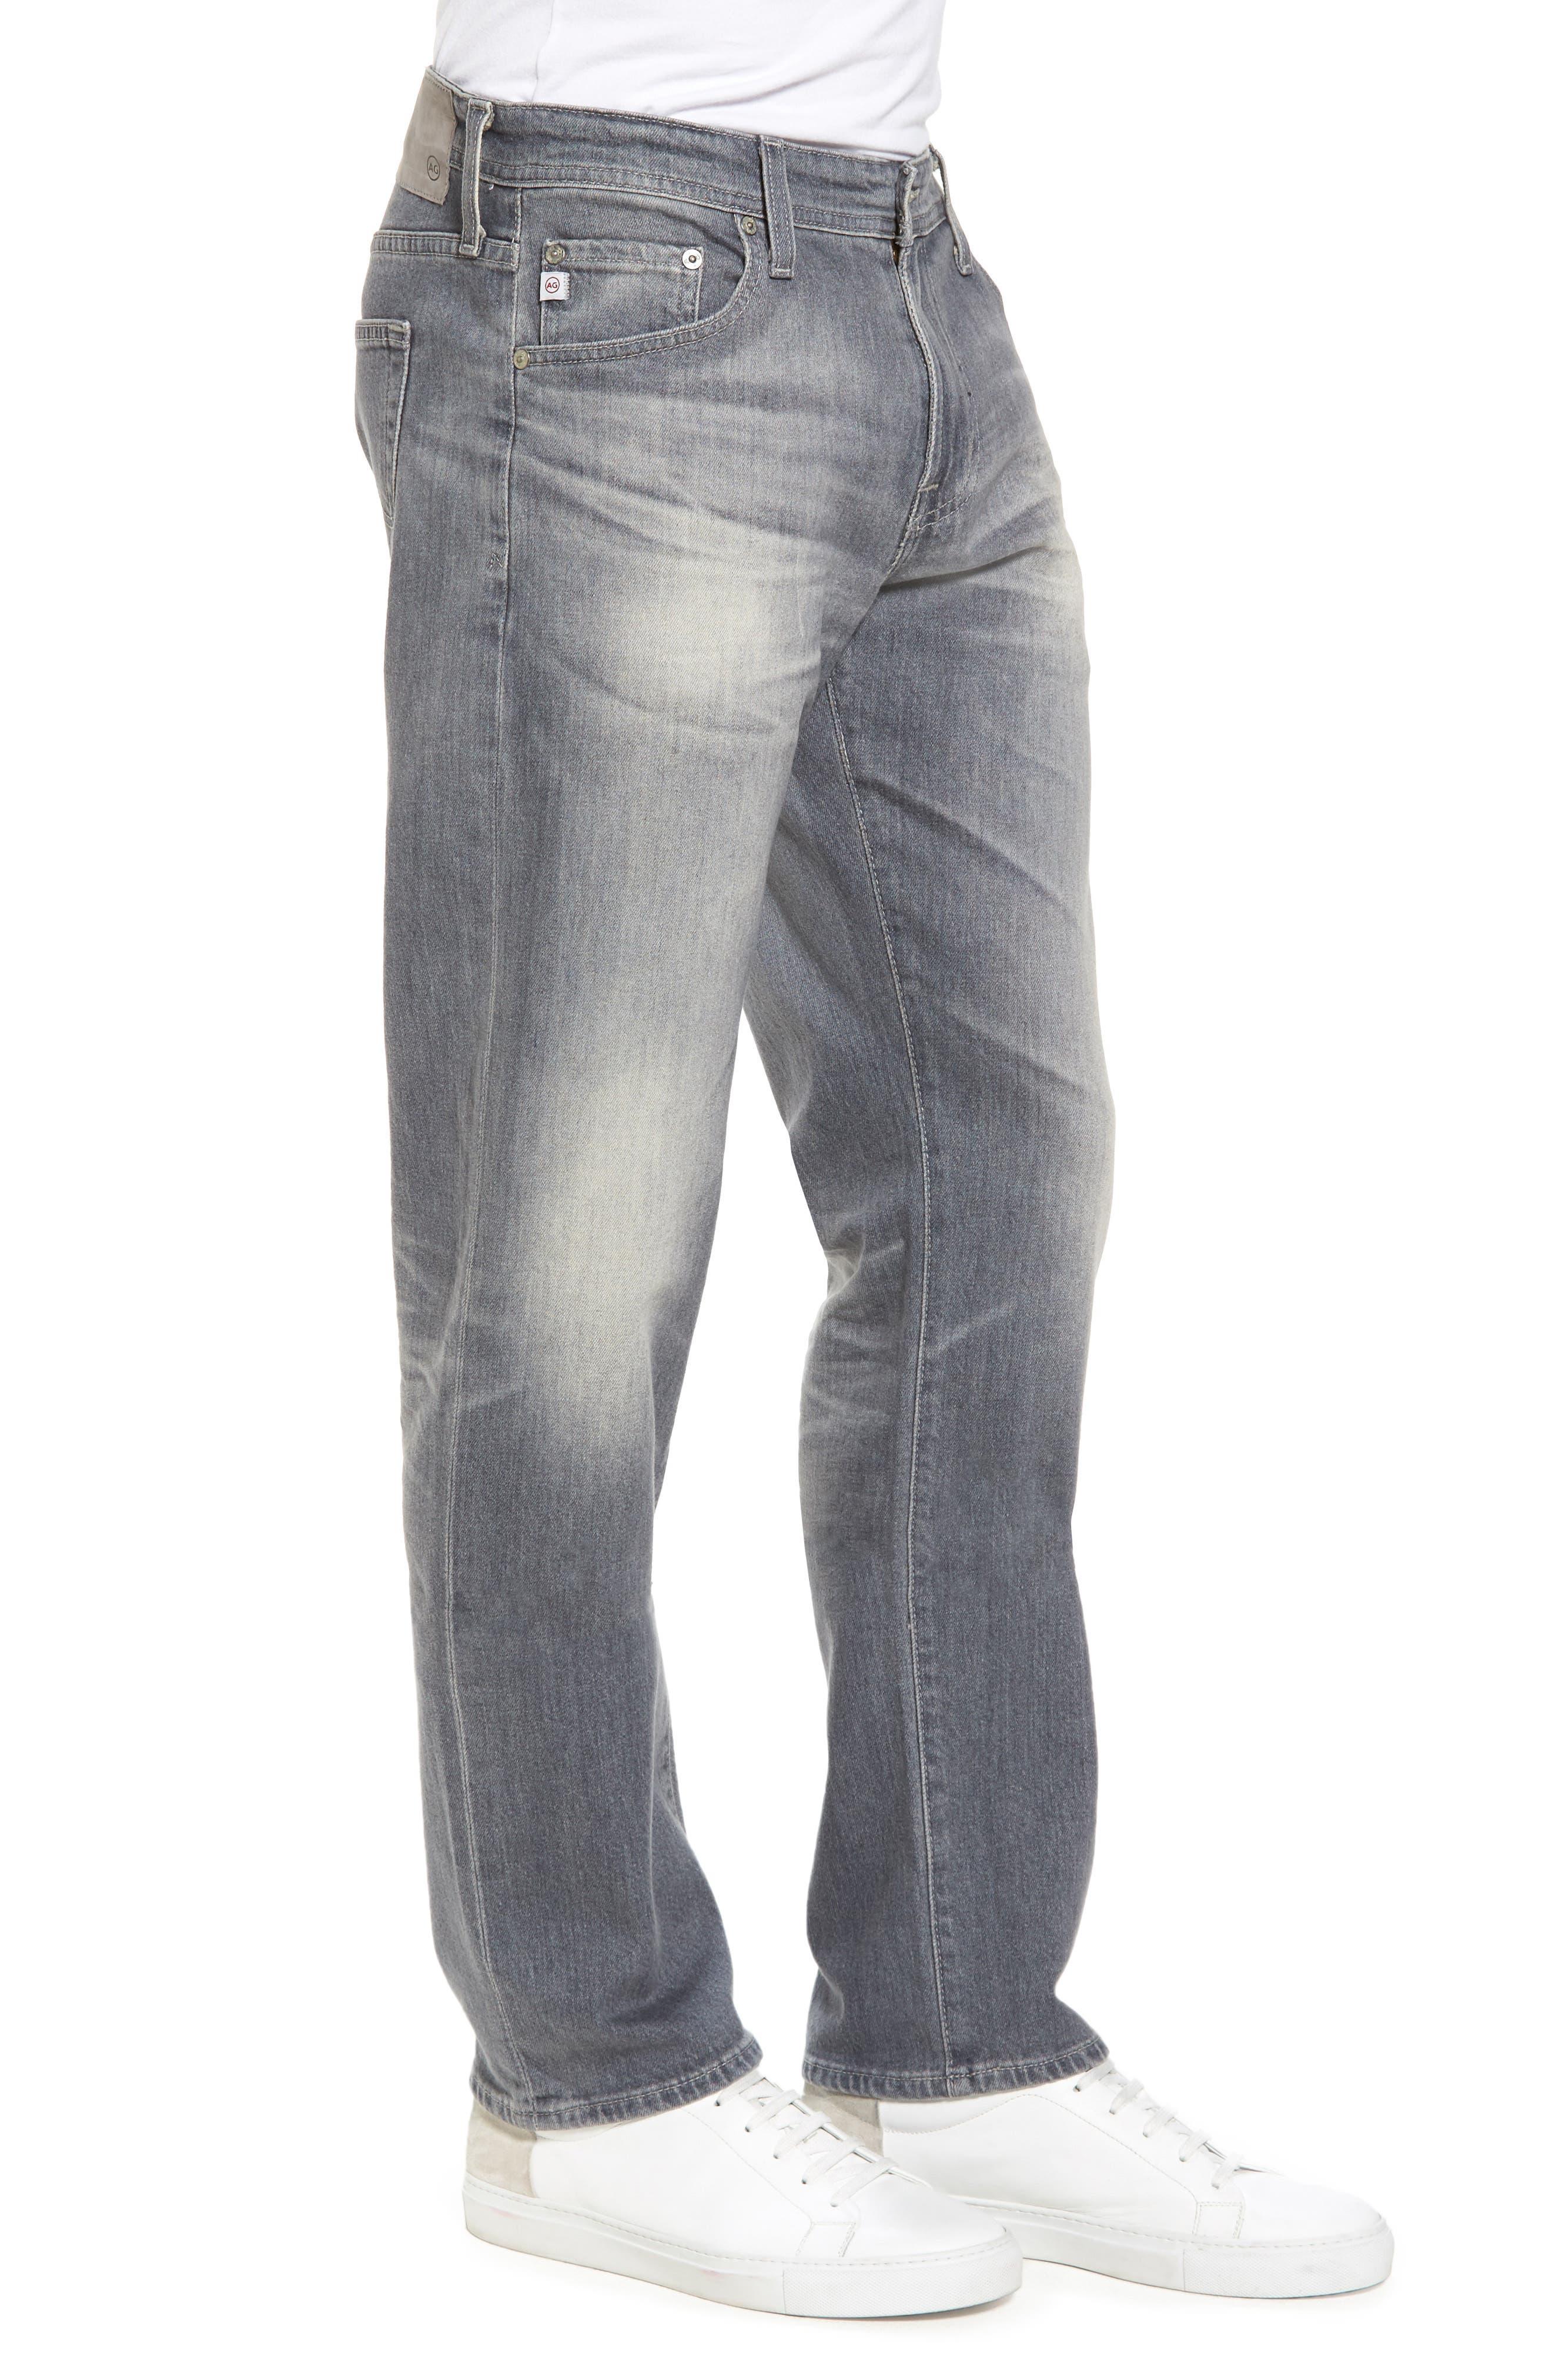 Graduate Slim Straight Fit Jeans,                             Alternate thumbnail 3, color,                             020